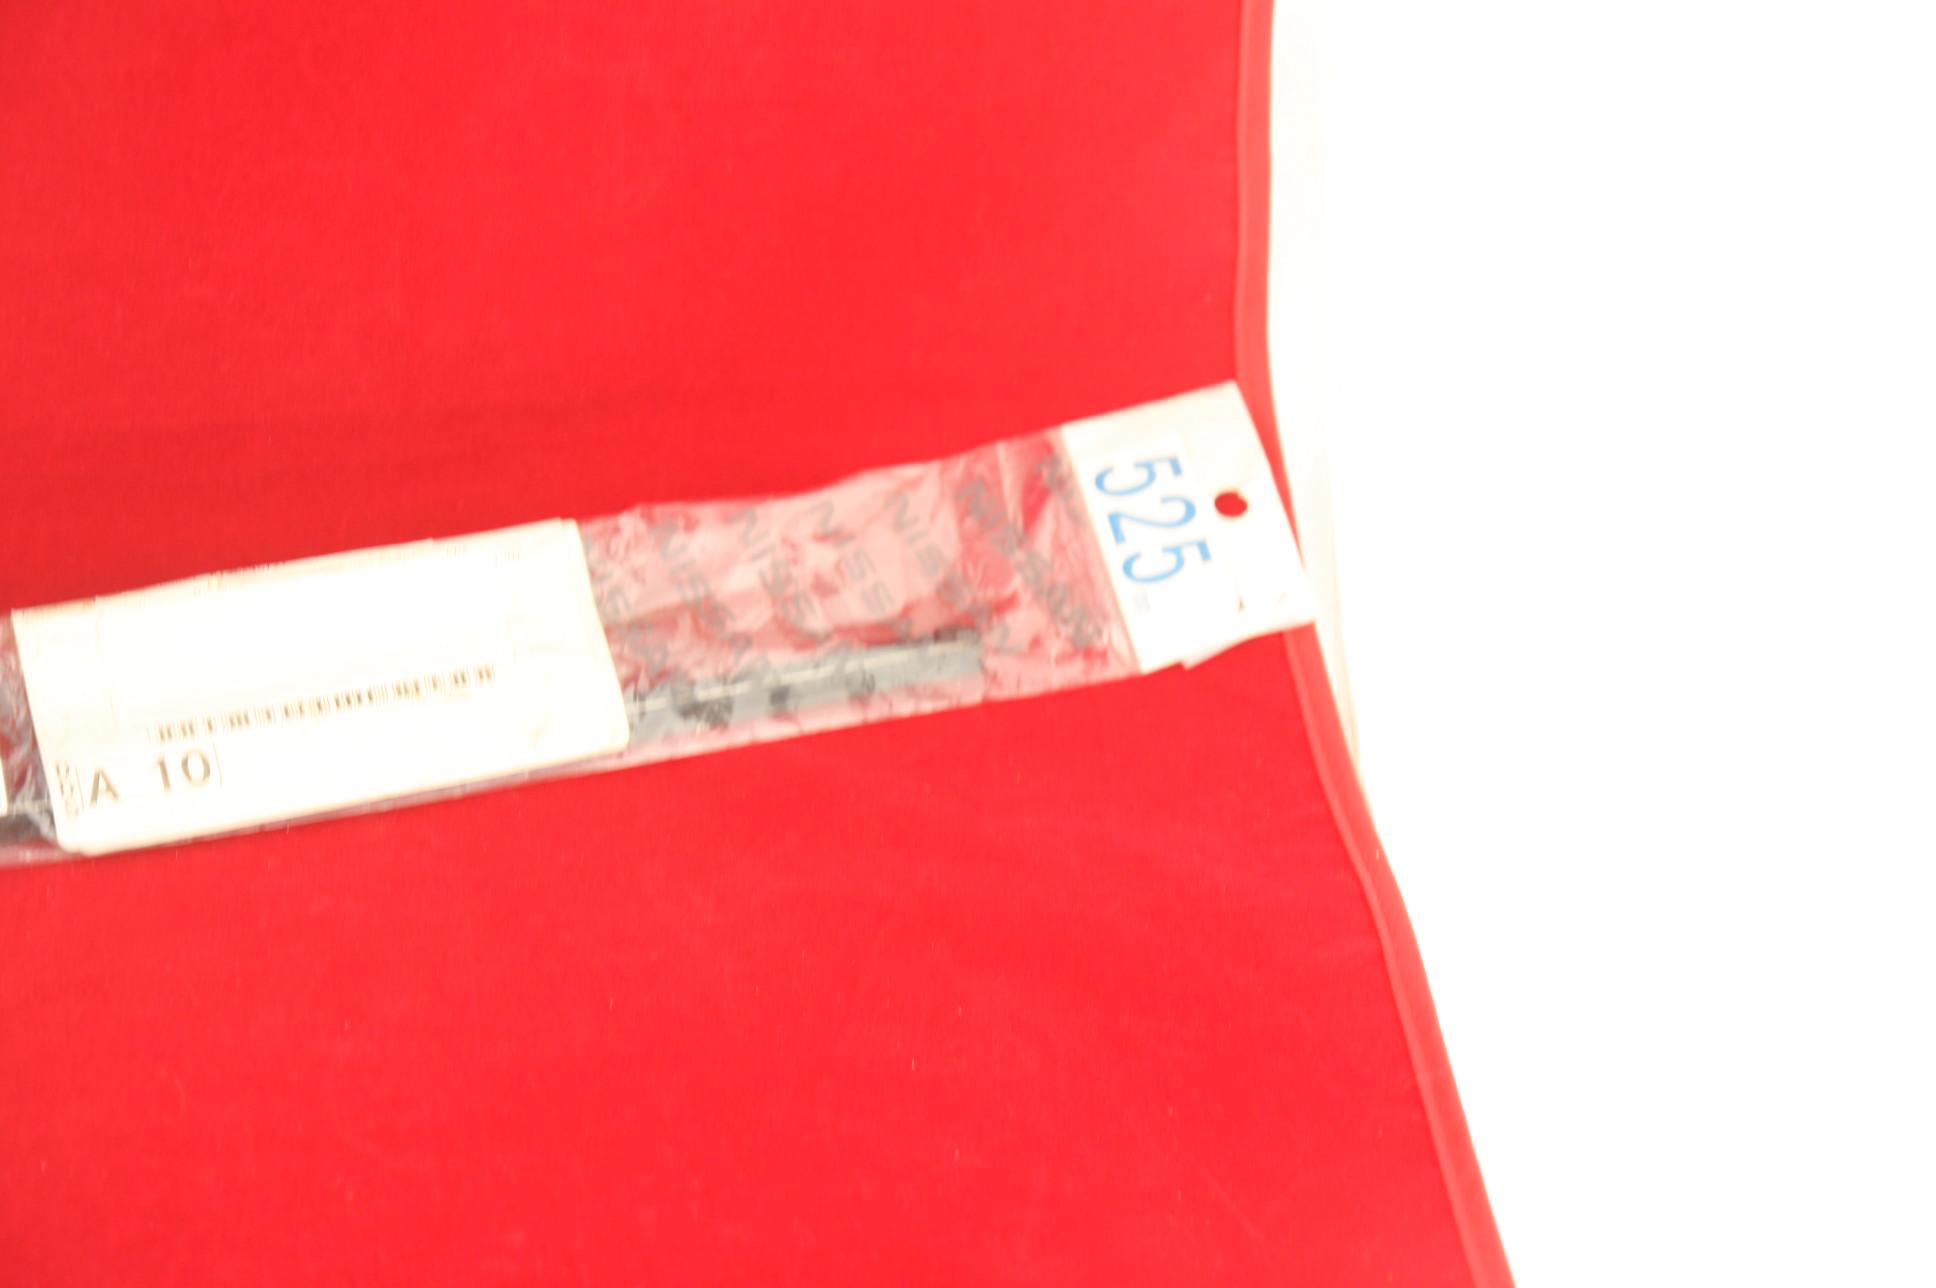 ~ New Nissan OEM 28895-84M00 Wiper Blade Refill Insert Free Shipping - image 4